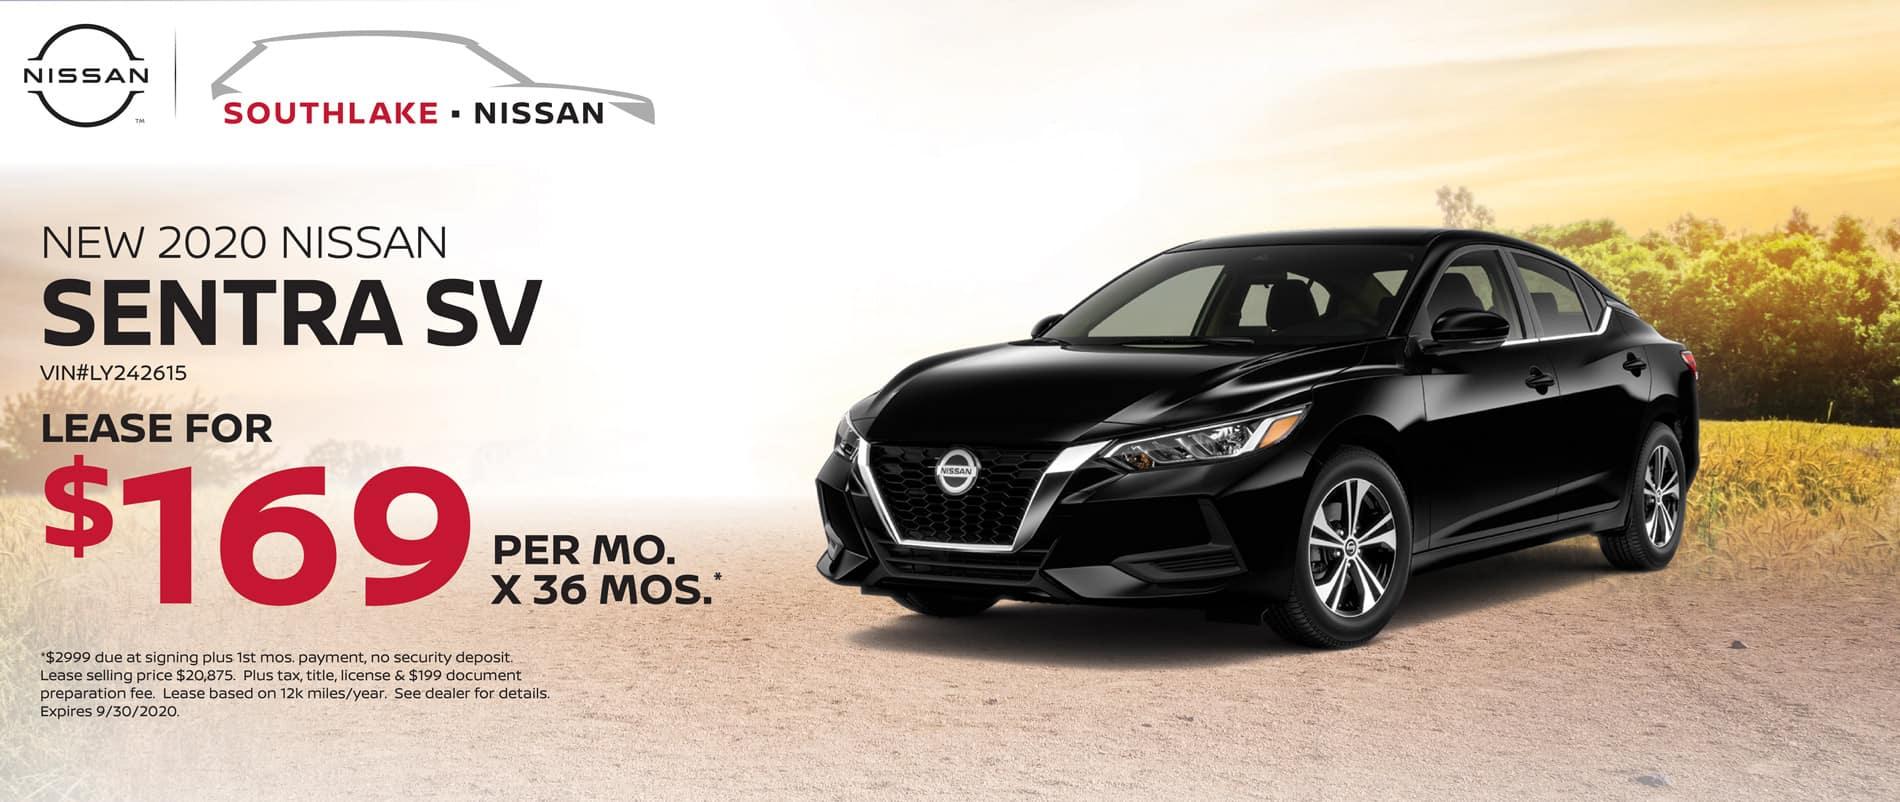 2020 Nissan Sentra Lease Offer | Merriville, IN